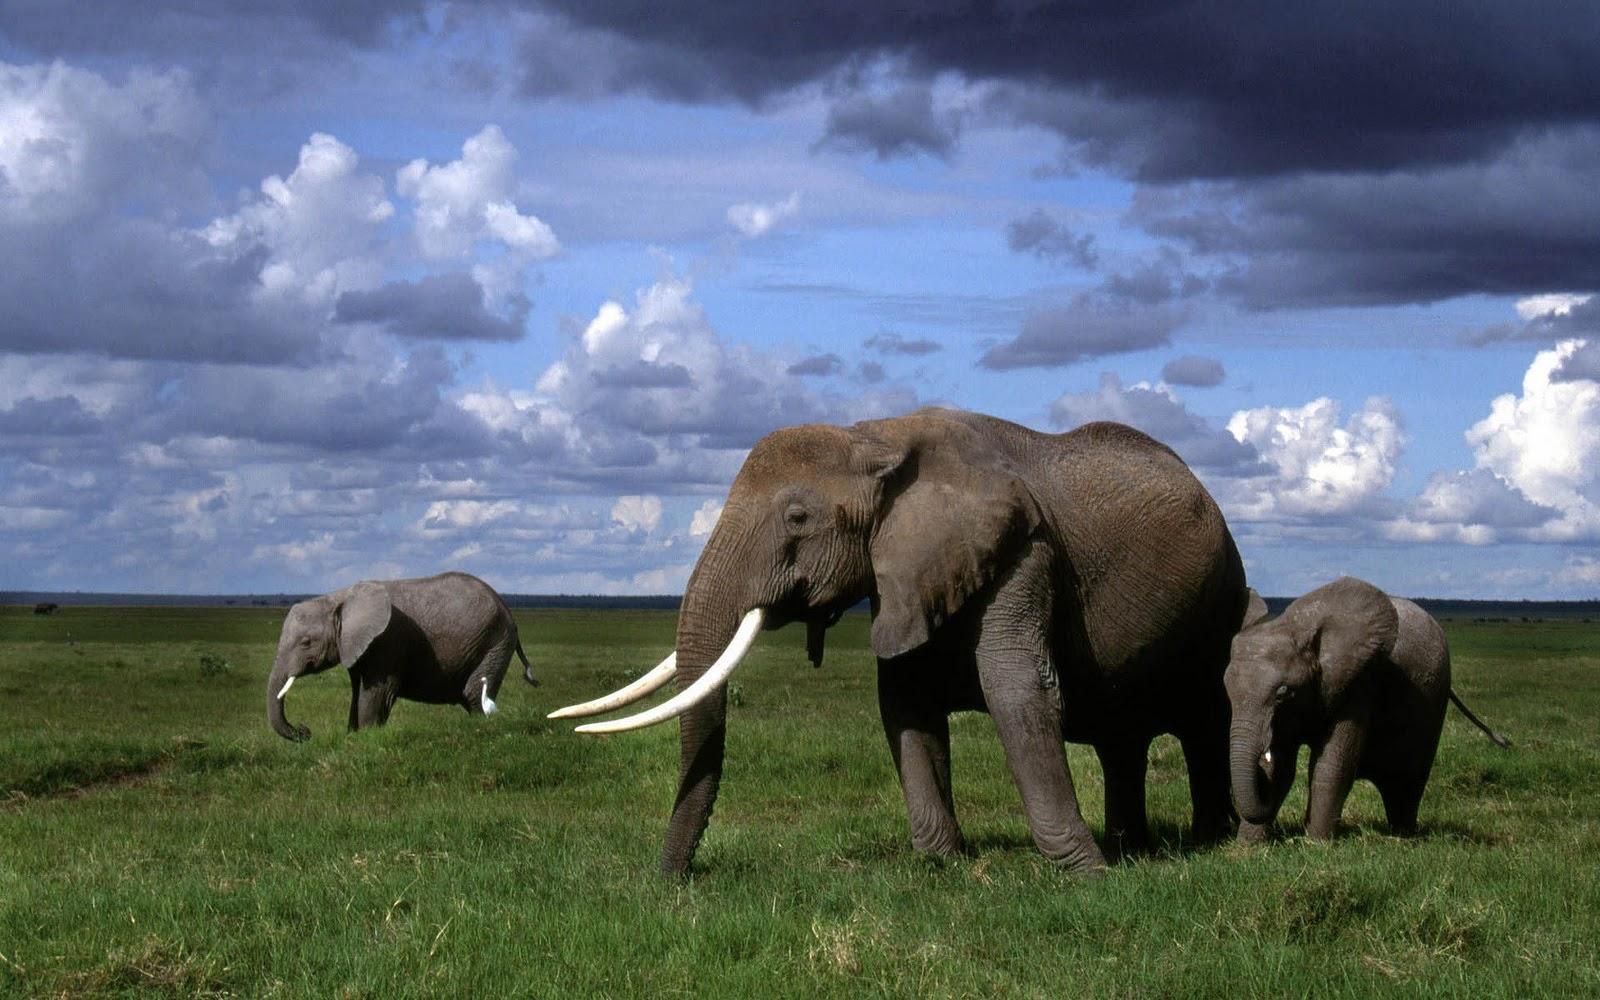 elephants wallpapers world - photo #6